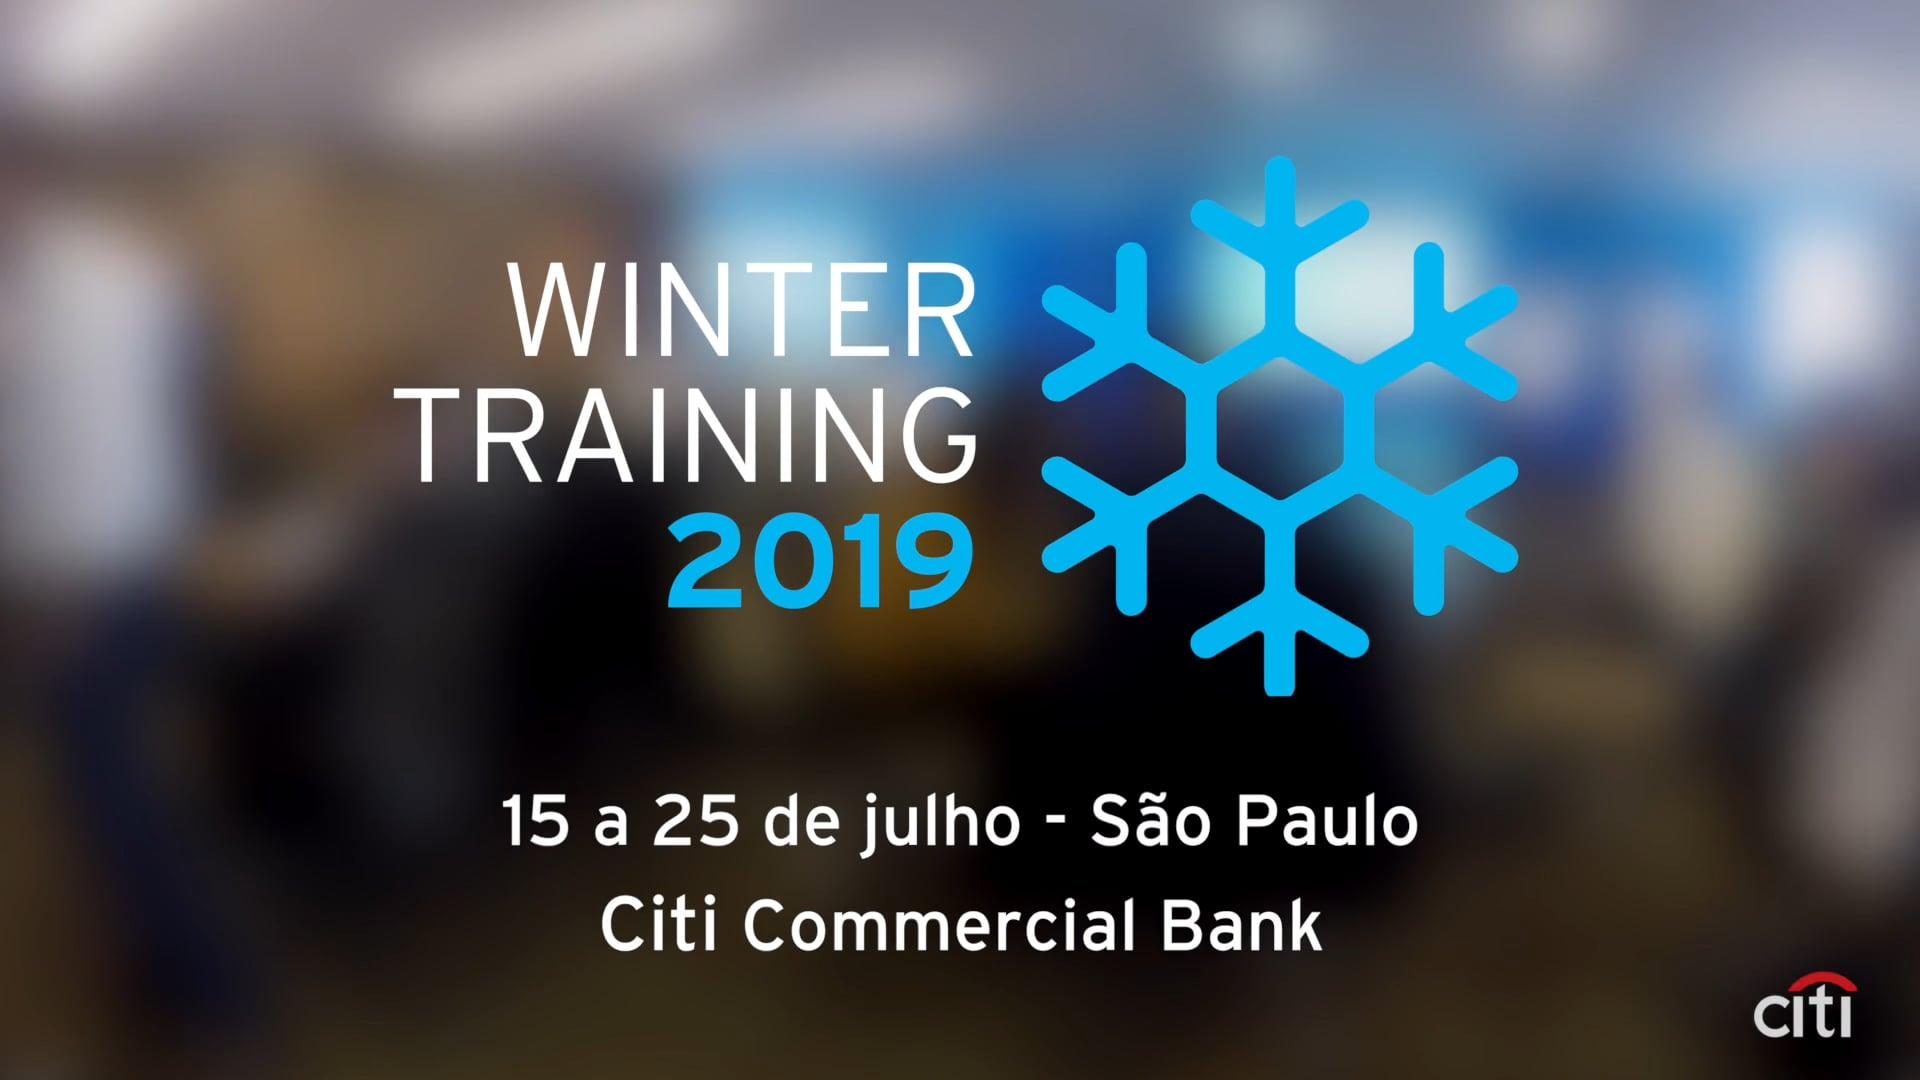 Citi - Winter Training